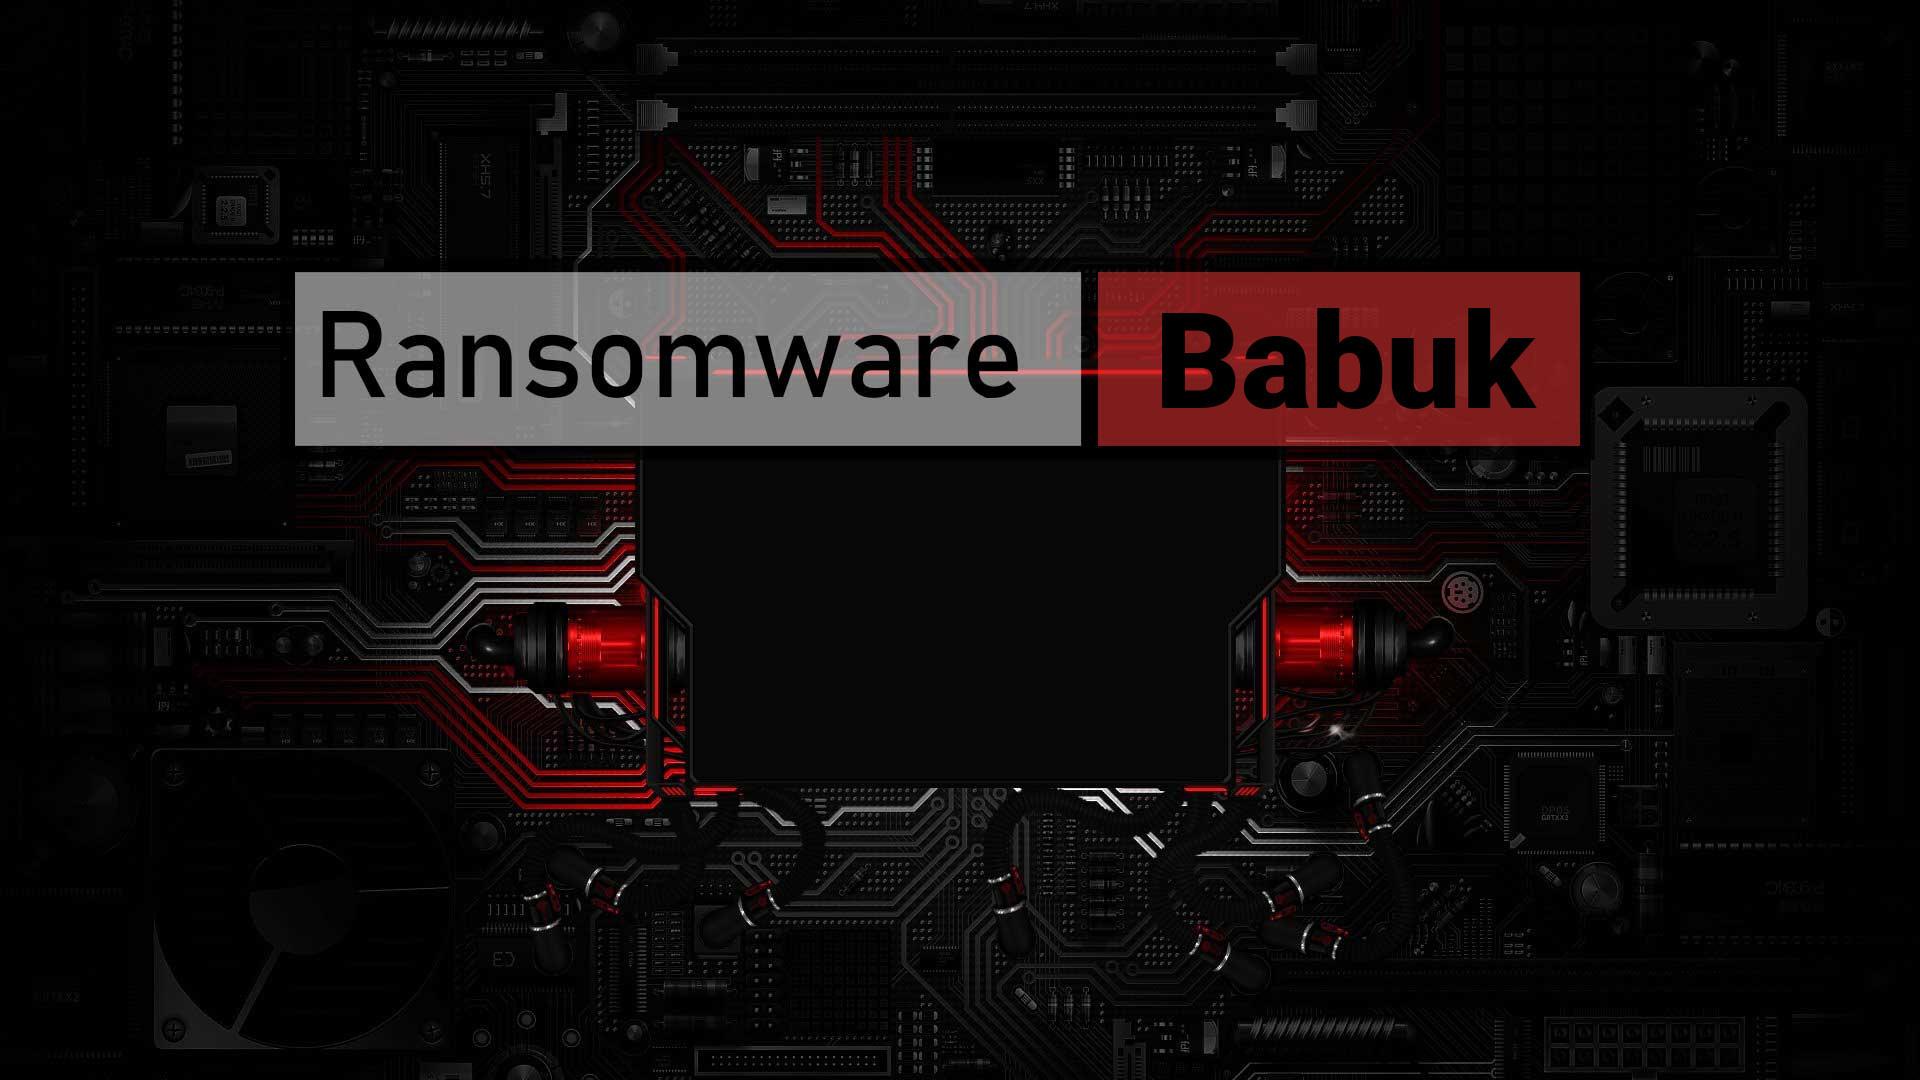 NBA: Οι Houston Rockets στο στόχαστρο ransomware συμμορίας!